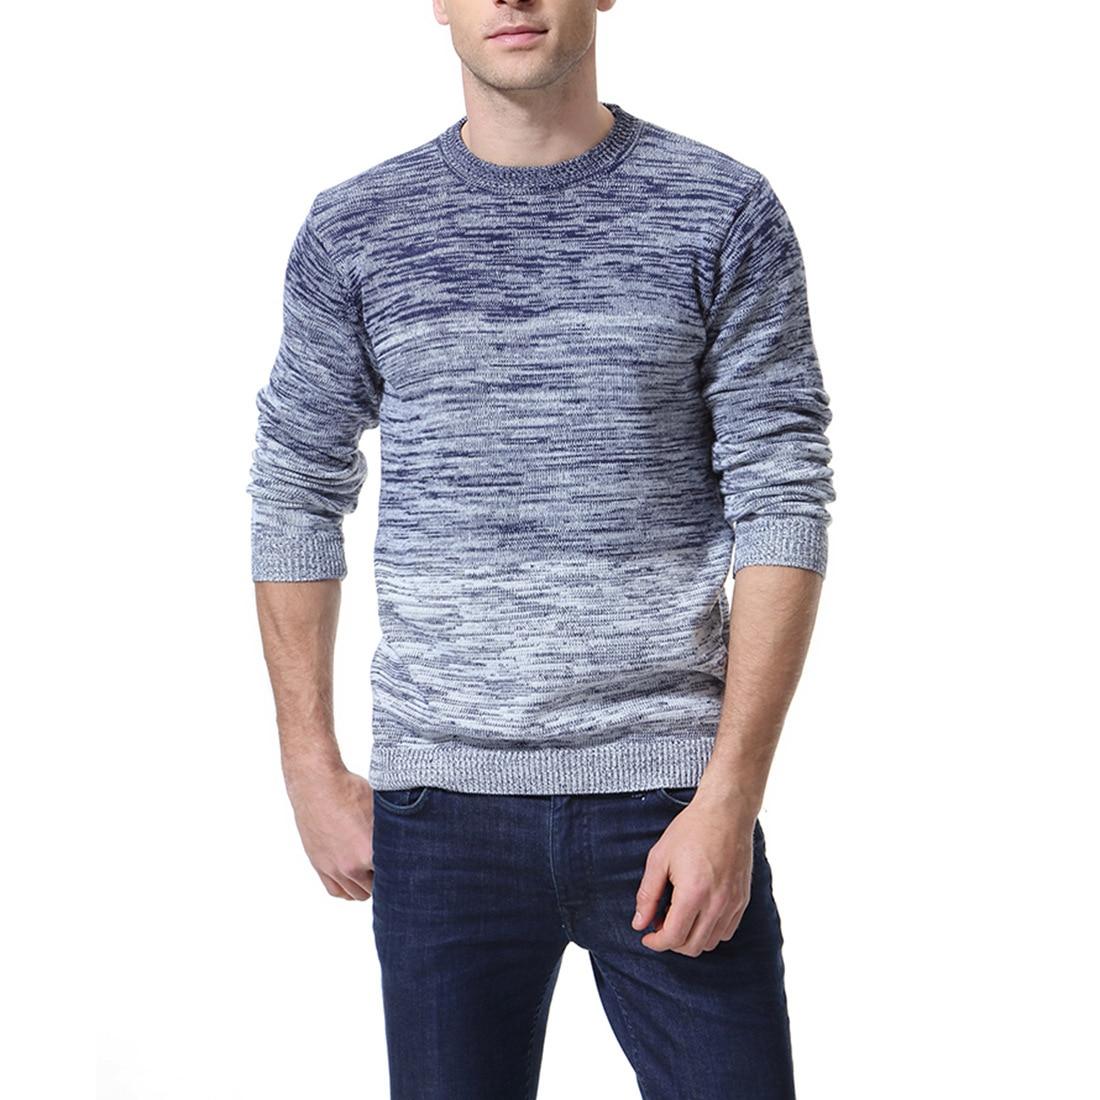 2020 Spring New Style Men Gradient Sweater Coat Youth Men'S Wear Crew Neck Knit Low Waist Jersey Xy963